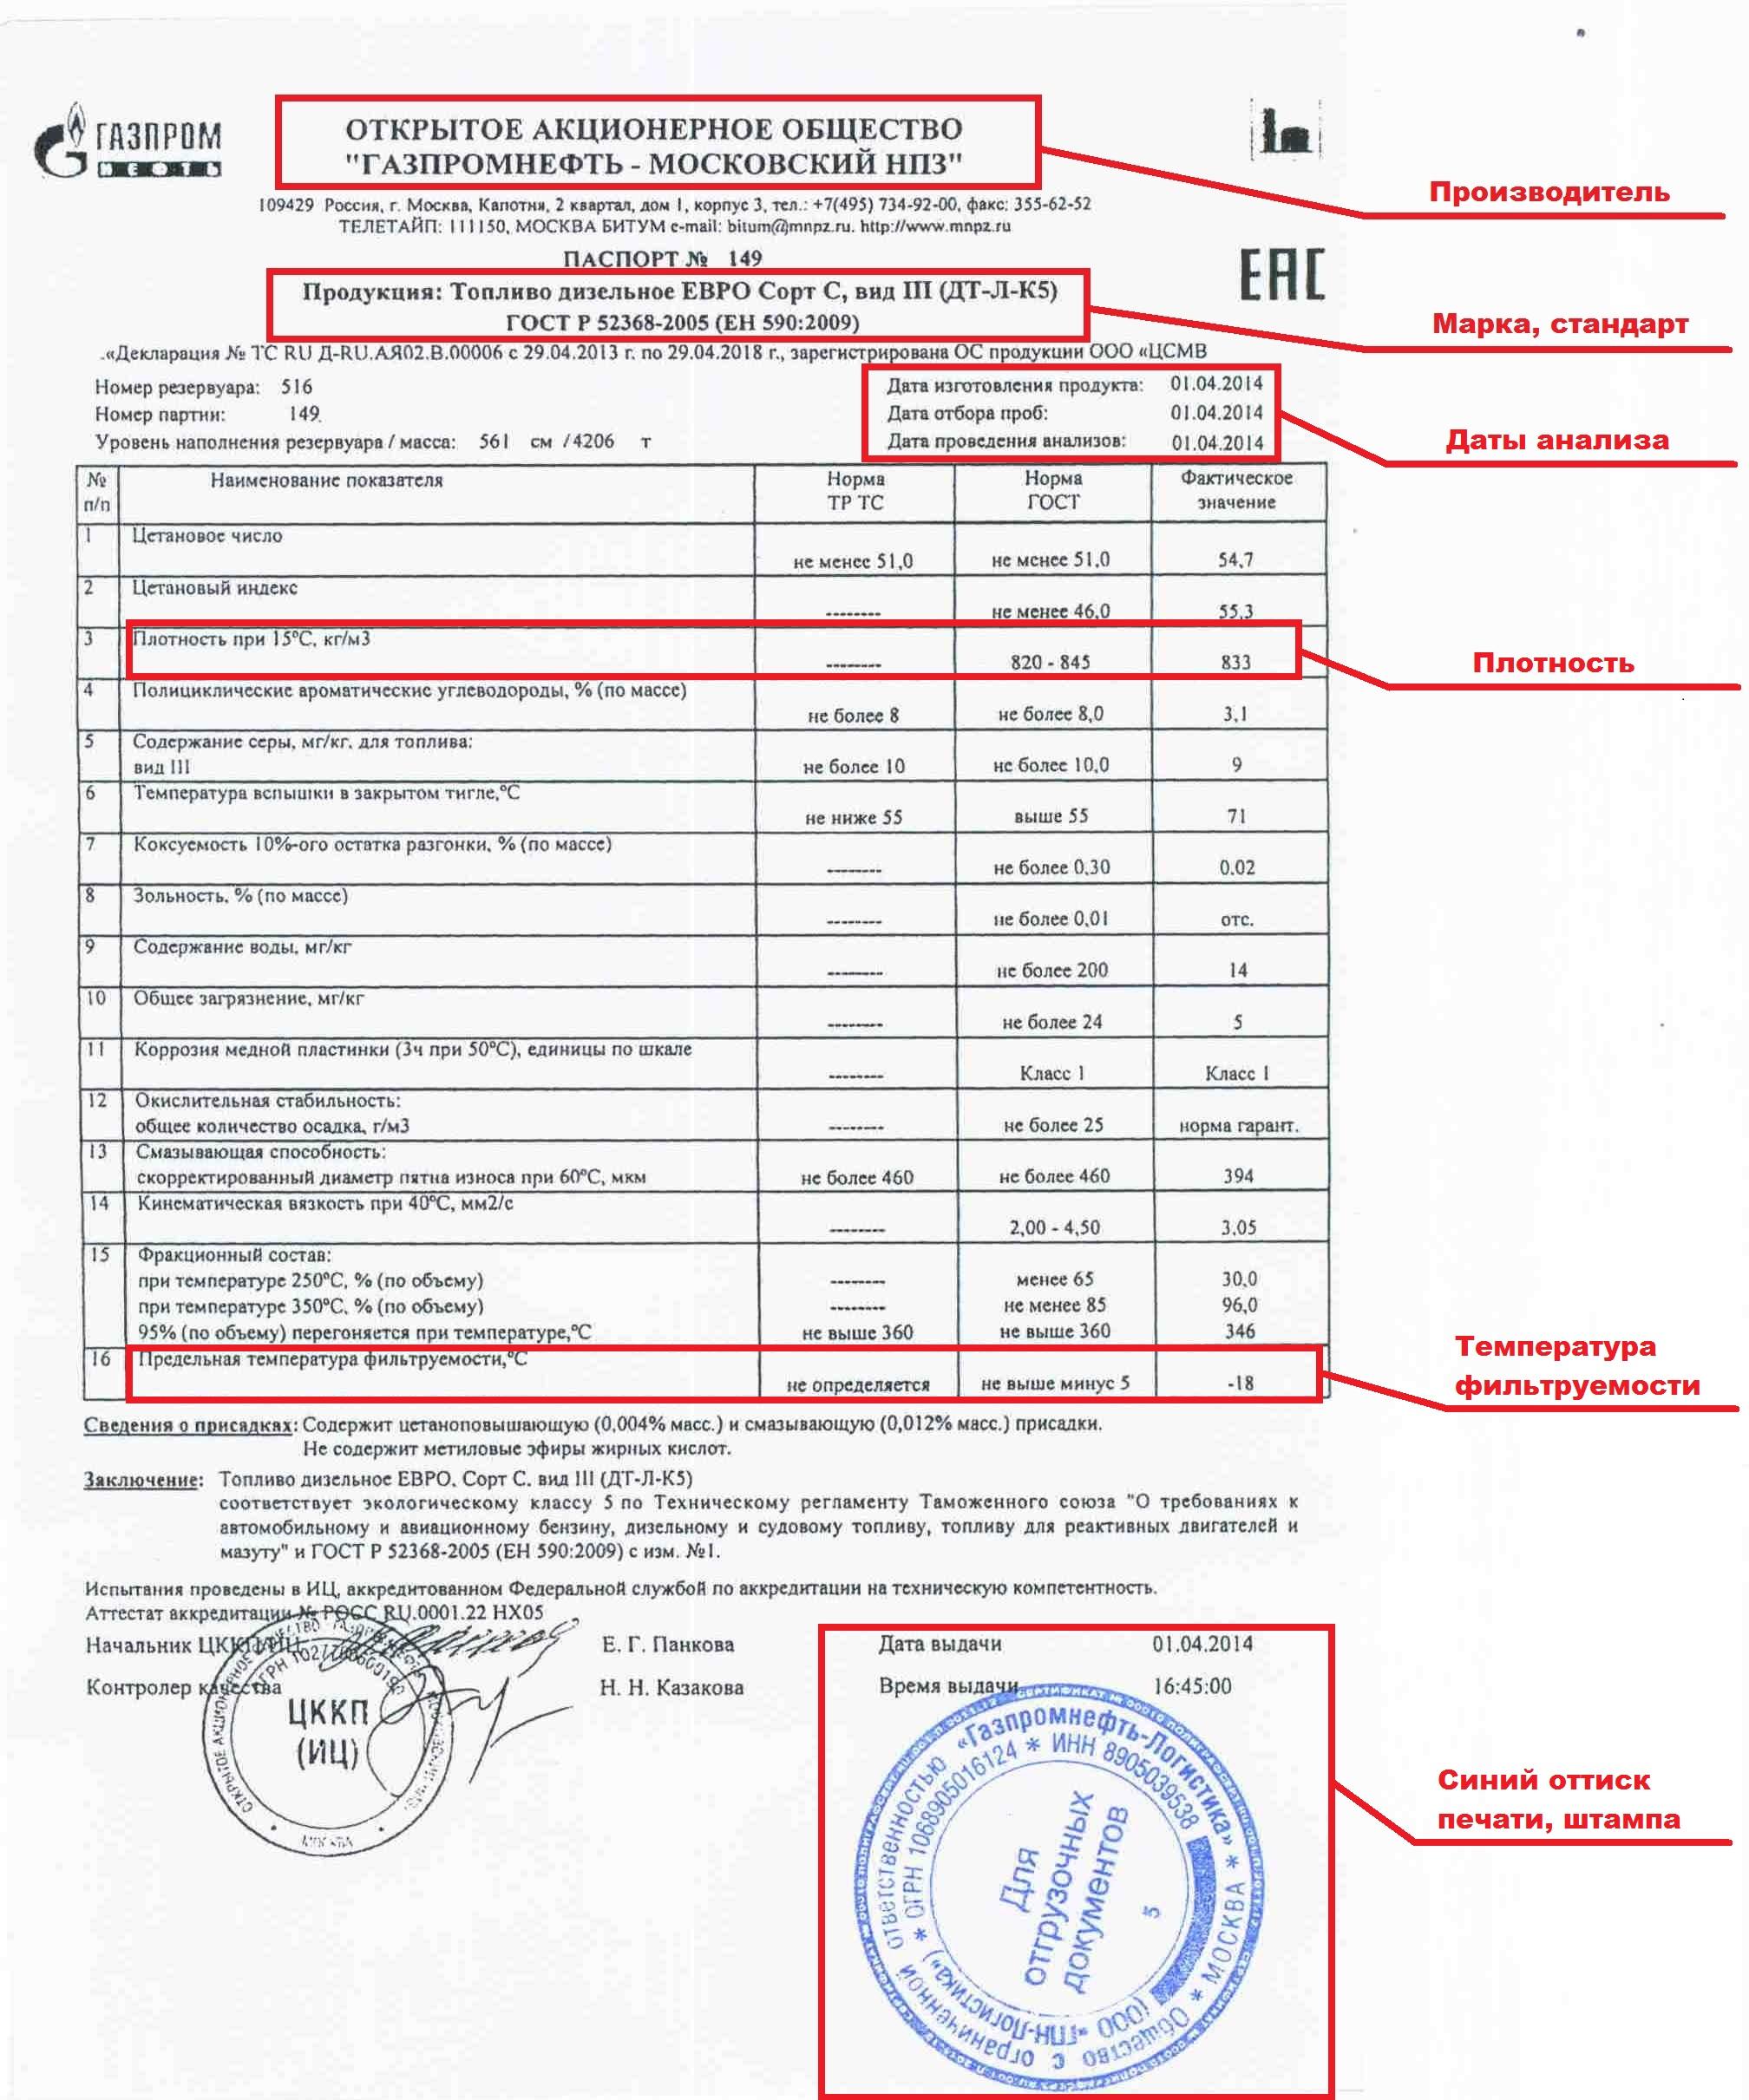 http://xn--d1acfdrboy8h.xn--p1ai/images/dizelnoe_toplivo/pasport_kachestva_dizelnogo_topliva.jpg